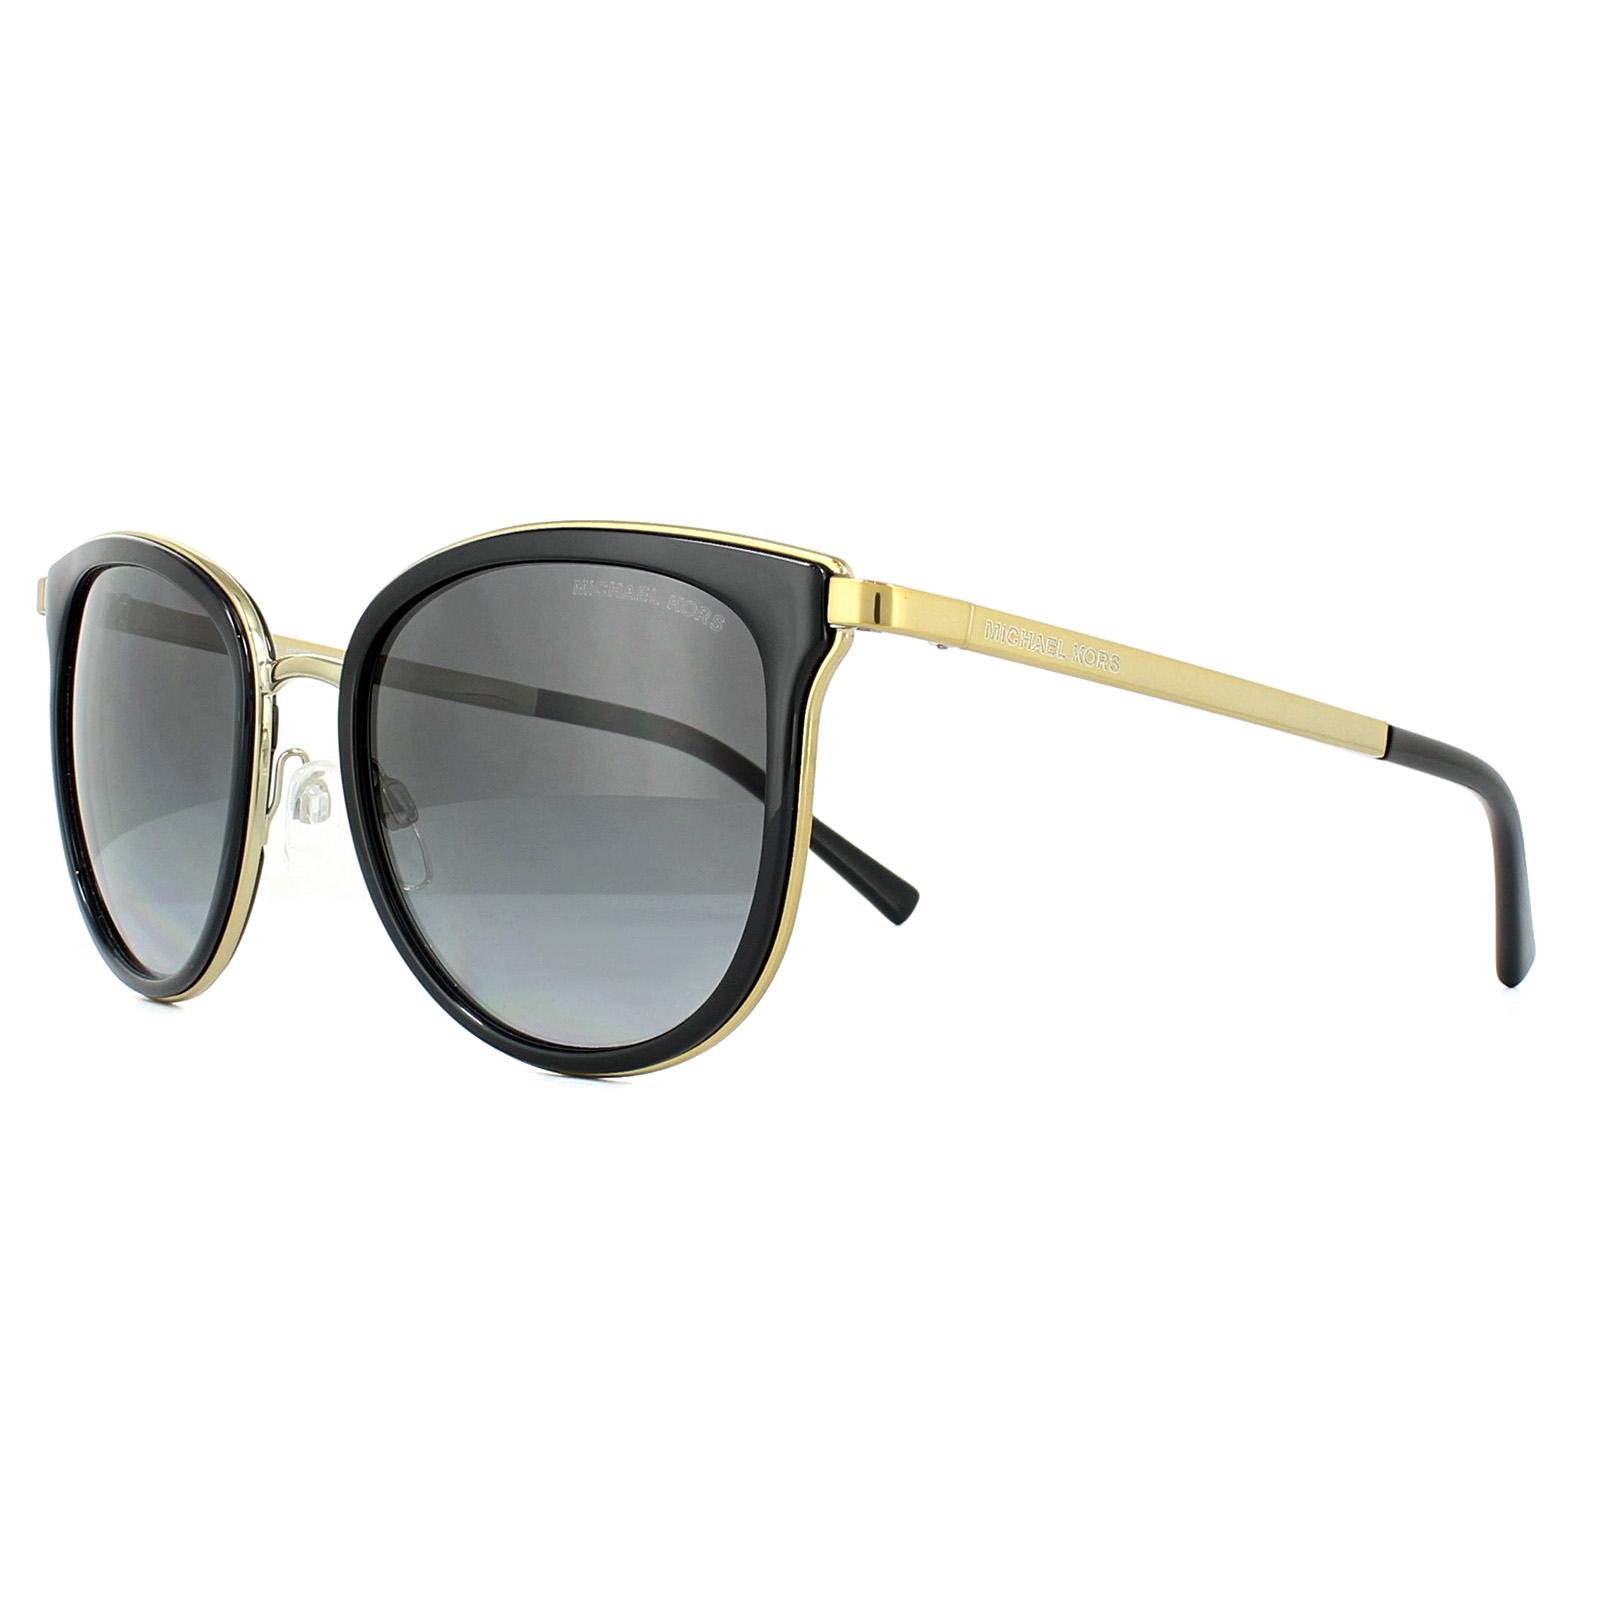 fb1b277bdb6 Sentinel Michael Kors Sunglasses Adrianna 1 1010 1100T3 Black Gold Grey  Shaded Polarized